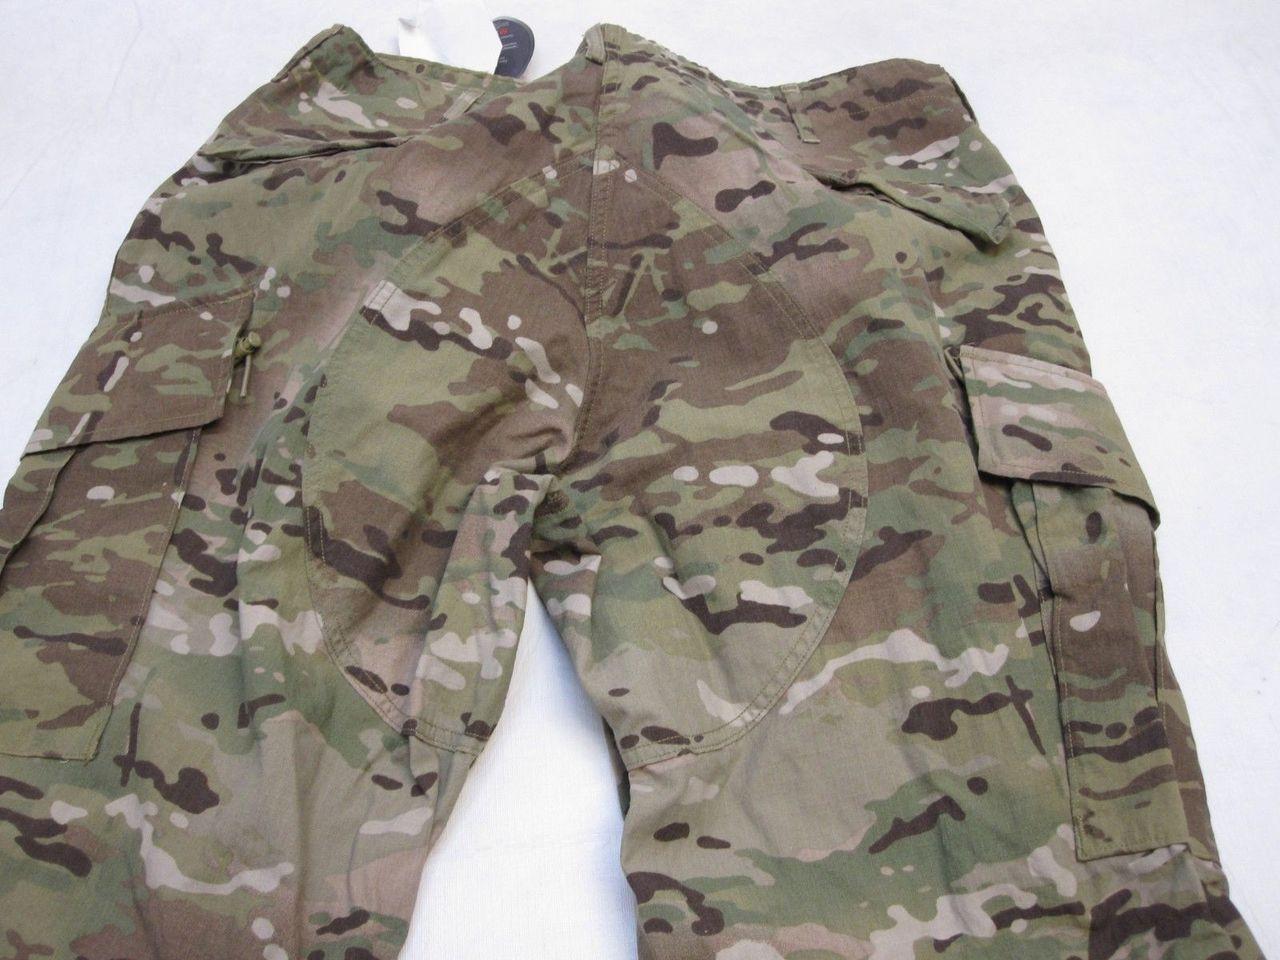 ARMY ISSUE MULTICAM COMBAT PANTS FLAME RESISTANT FRACU X-LARGE/REG TROUSER C1